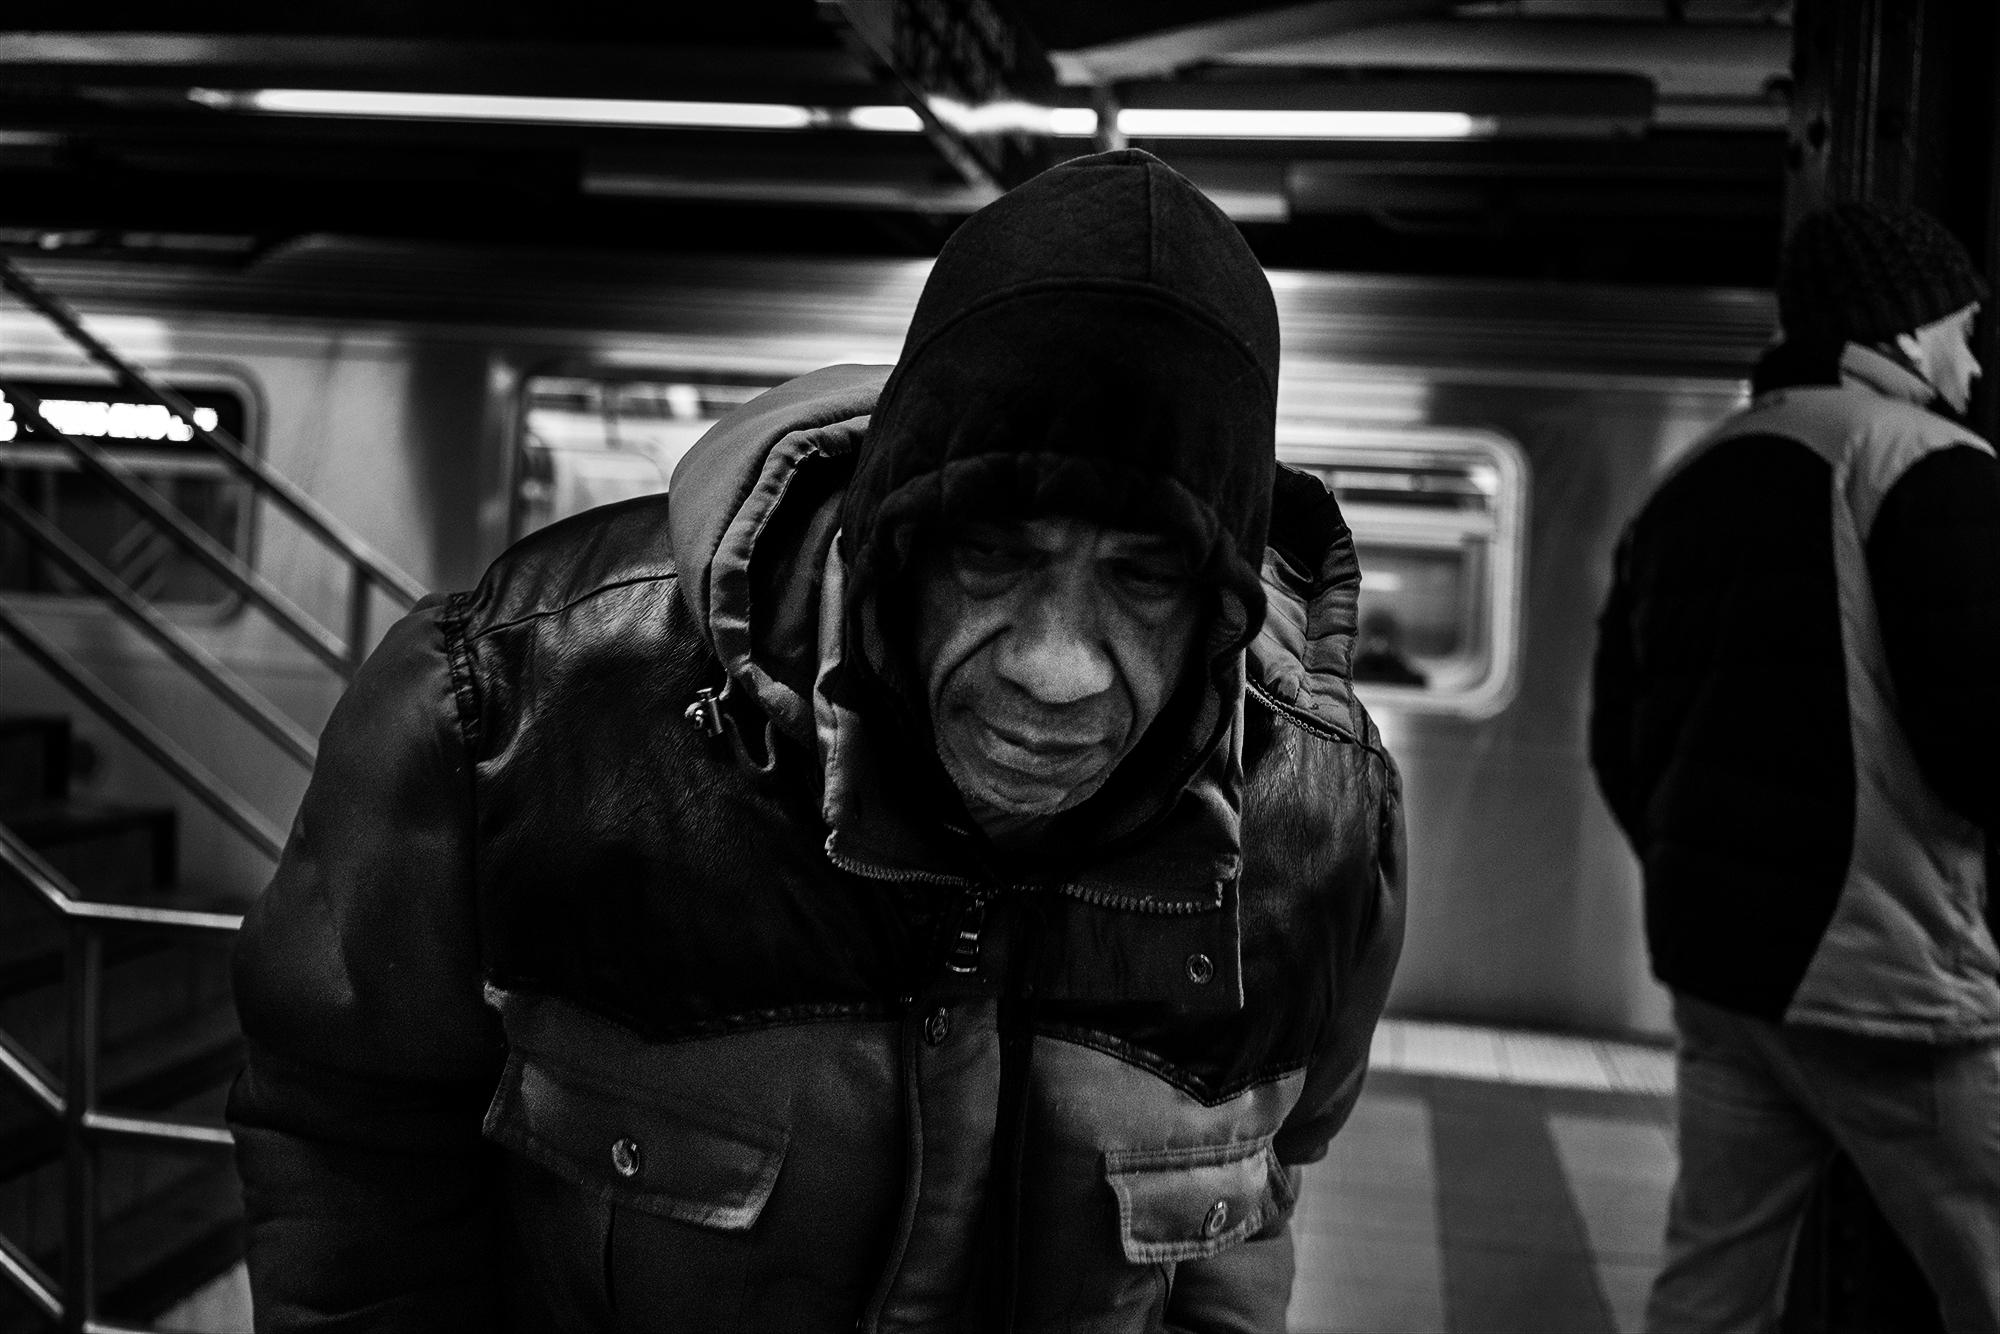 Brklyn_Subway_Old_Black_Man_with_Hoody-001.jpg